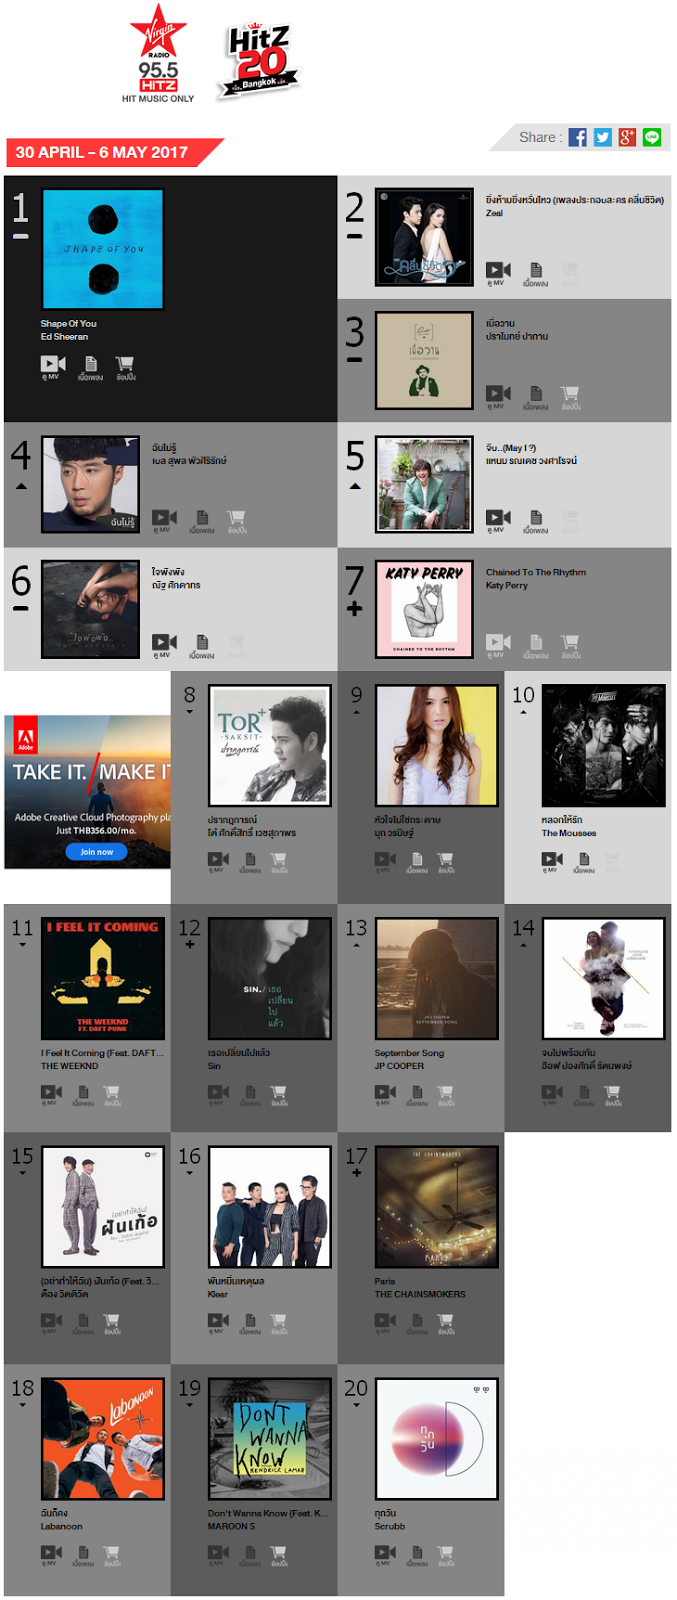 Download [Mp3]-[Chart] เวอร์จิ้นฮิต เพลงฮิต 20 อันดับบนคลื่น 95.5 FM Virgin Hitz TOP 20 ประจำวันที่ 30 เมษายน – 6 พฤษภาคม2560 4shared By Pleng-mun.com